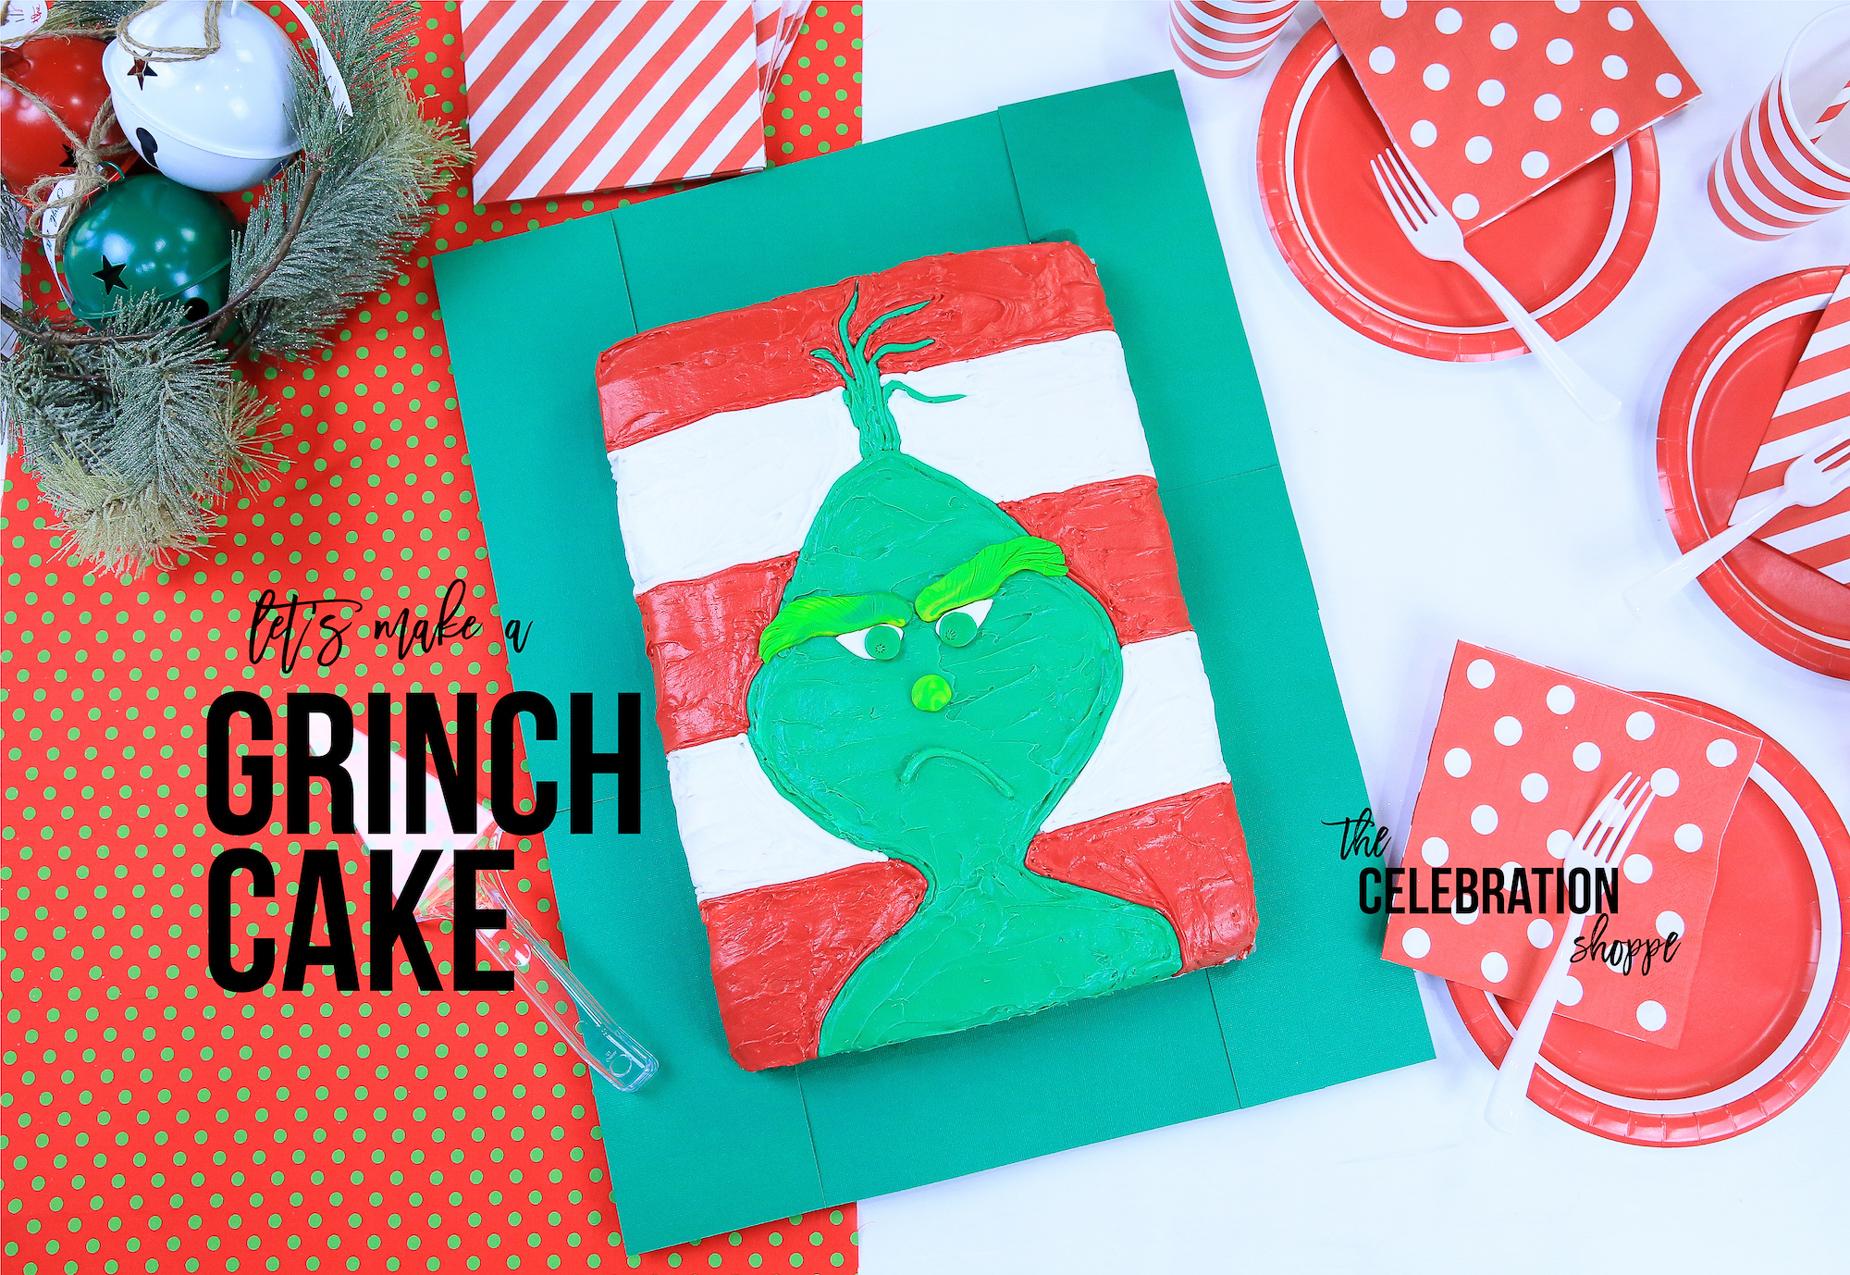 The Grinch Cake - Easy Christmas Sheet Cake